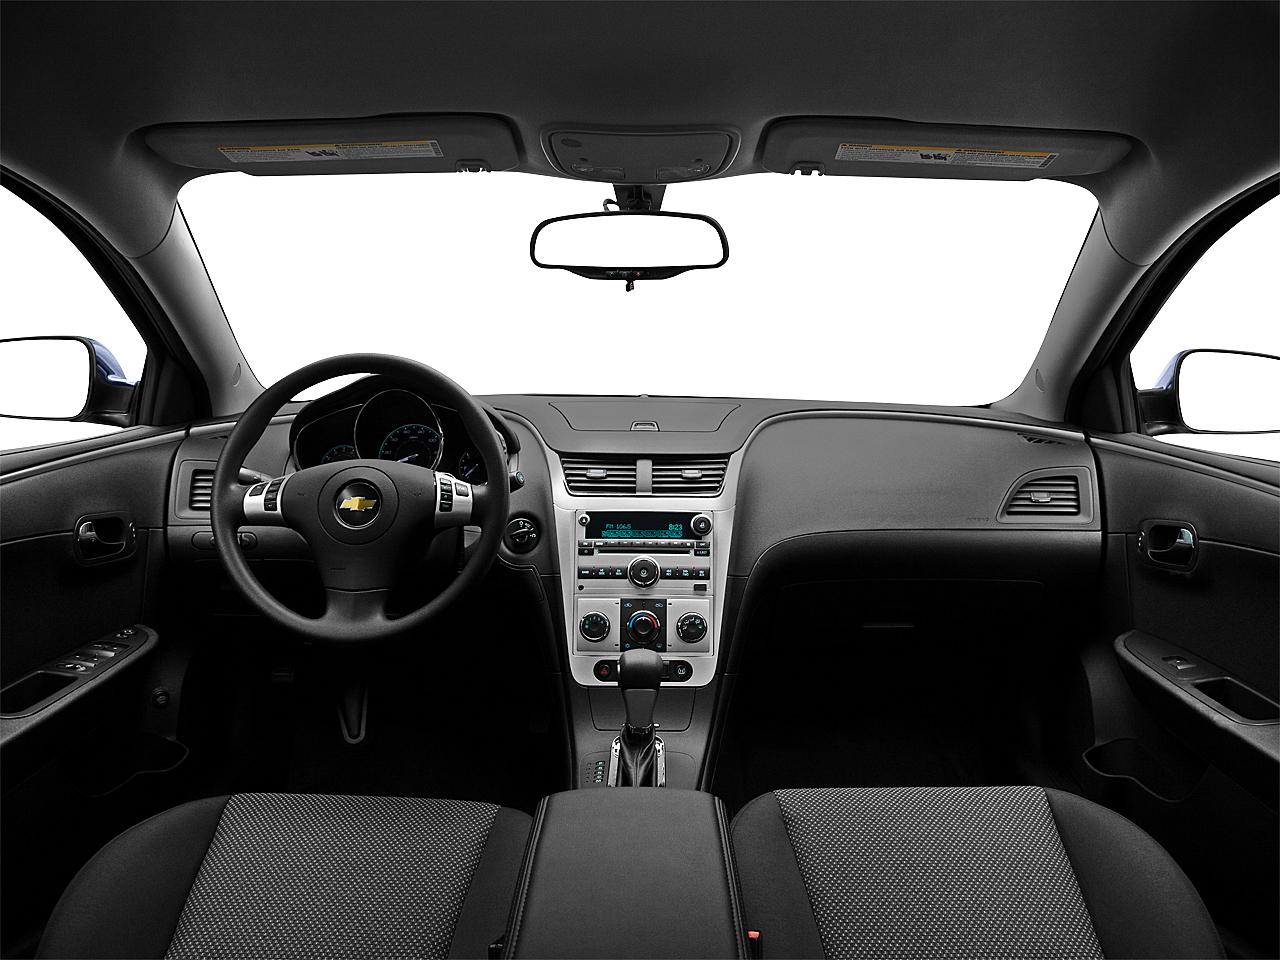 2011 Chevrolet Malibu Lt 4dr Sedan W 1lt Research Groovecar